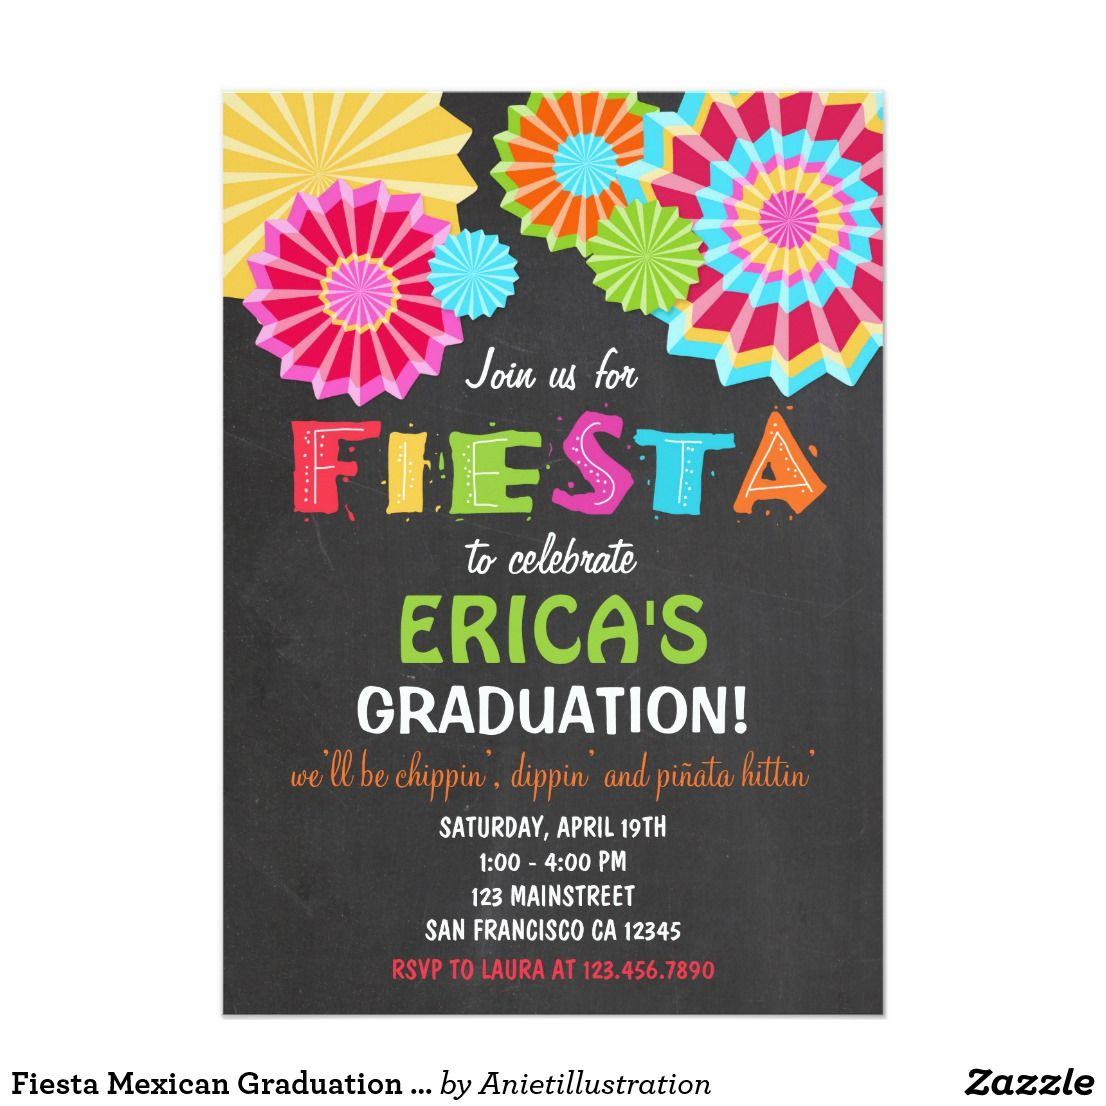 fiesta mexican graduation party invitation in 2018 congrats